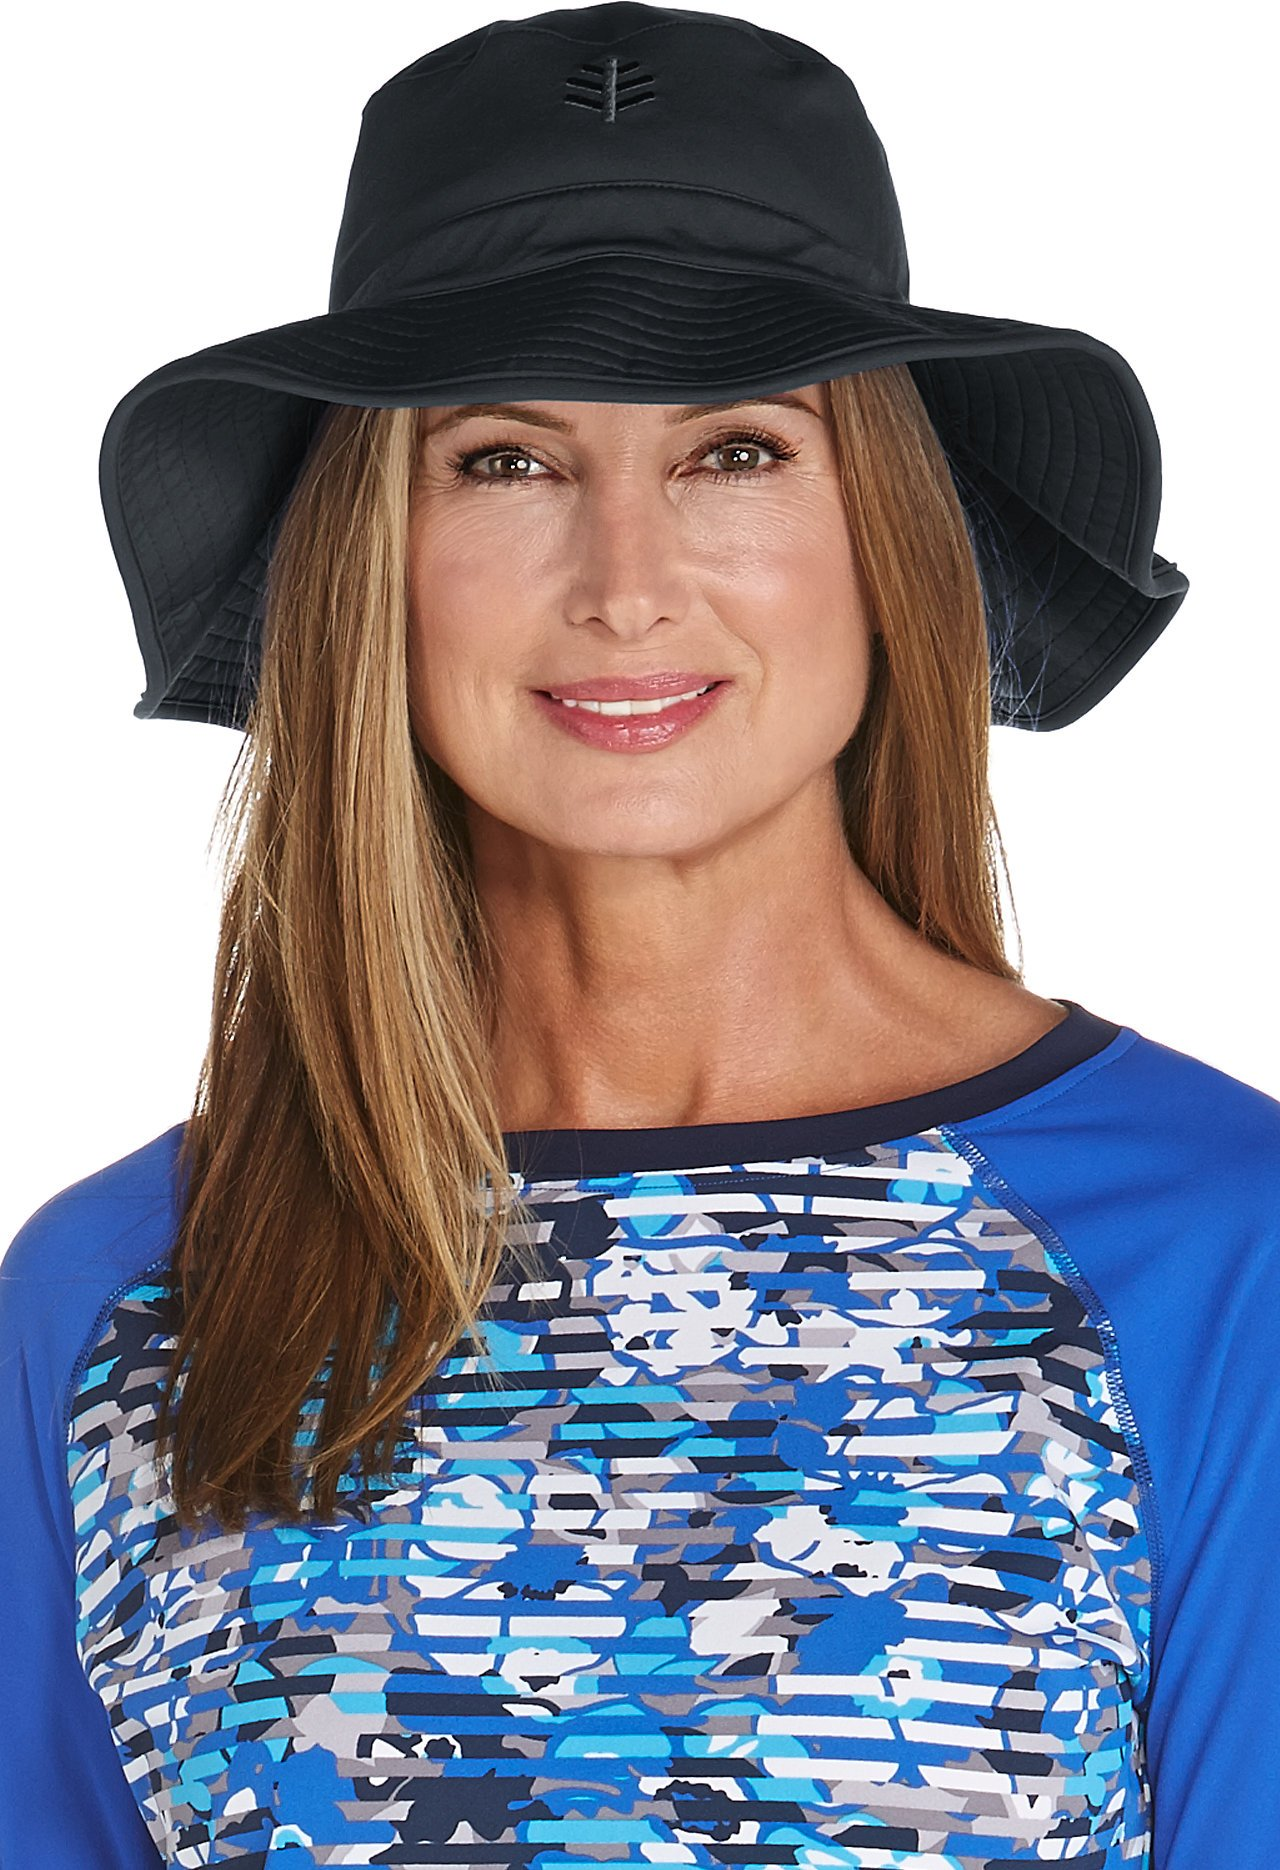 Coolibar UPF 50+ Women's Chlorine Resistant Bucket Hat - Sun Protective (Large/X-Large- Black)